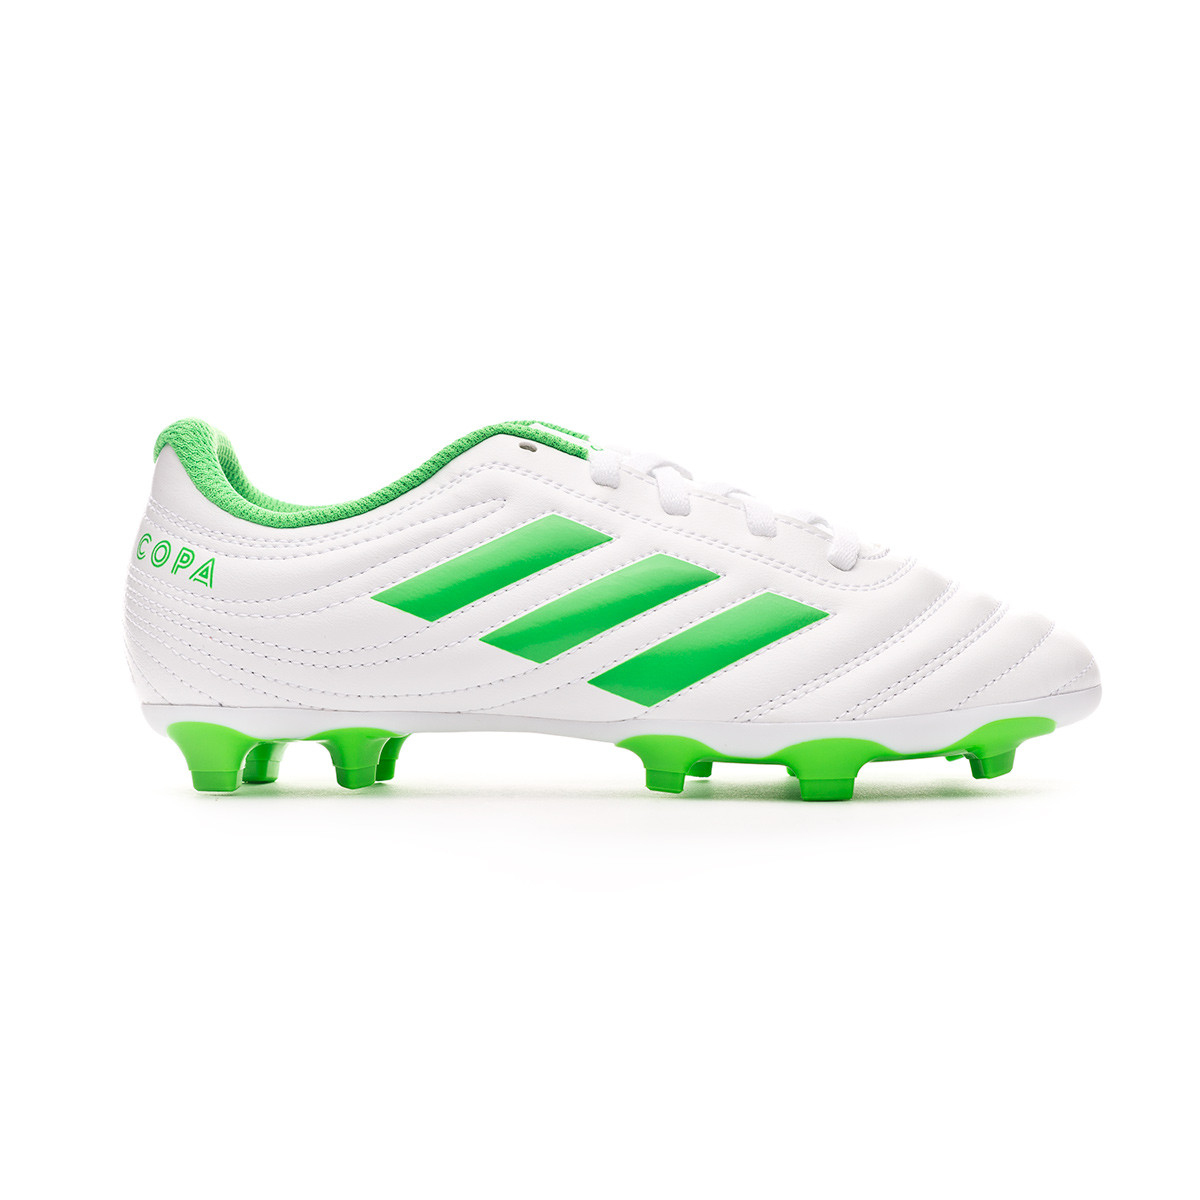 Chaussure de foot adidas Copa 19.4 FG enfant